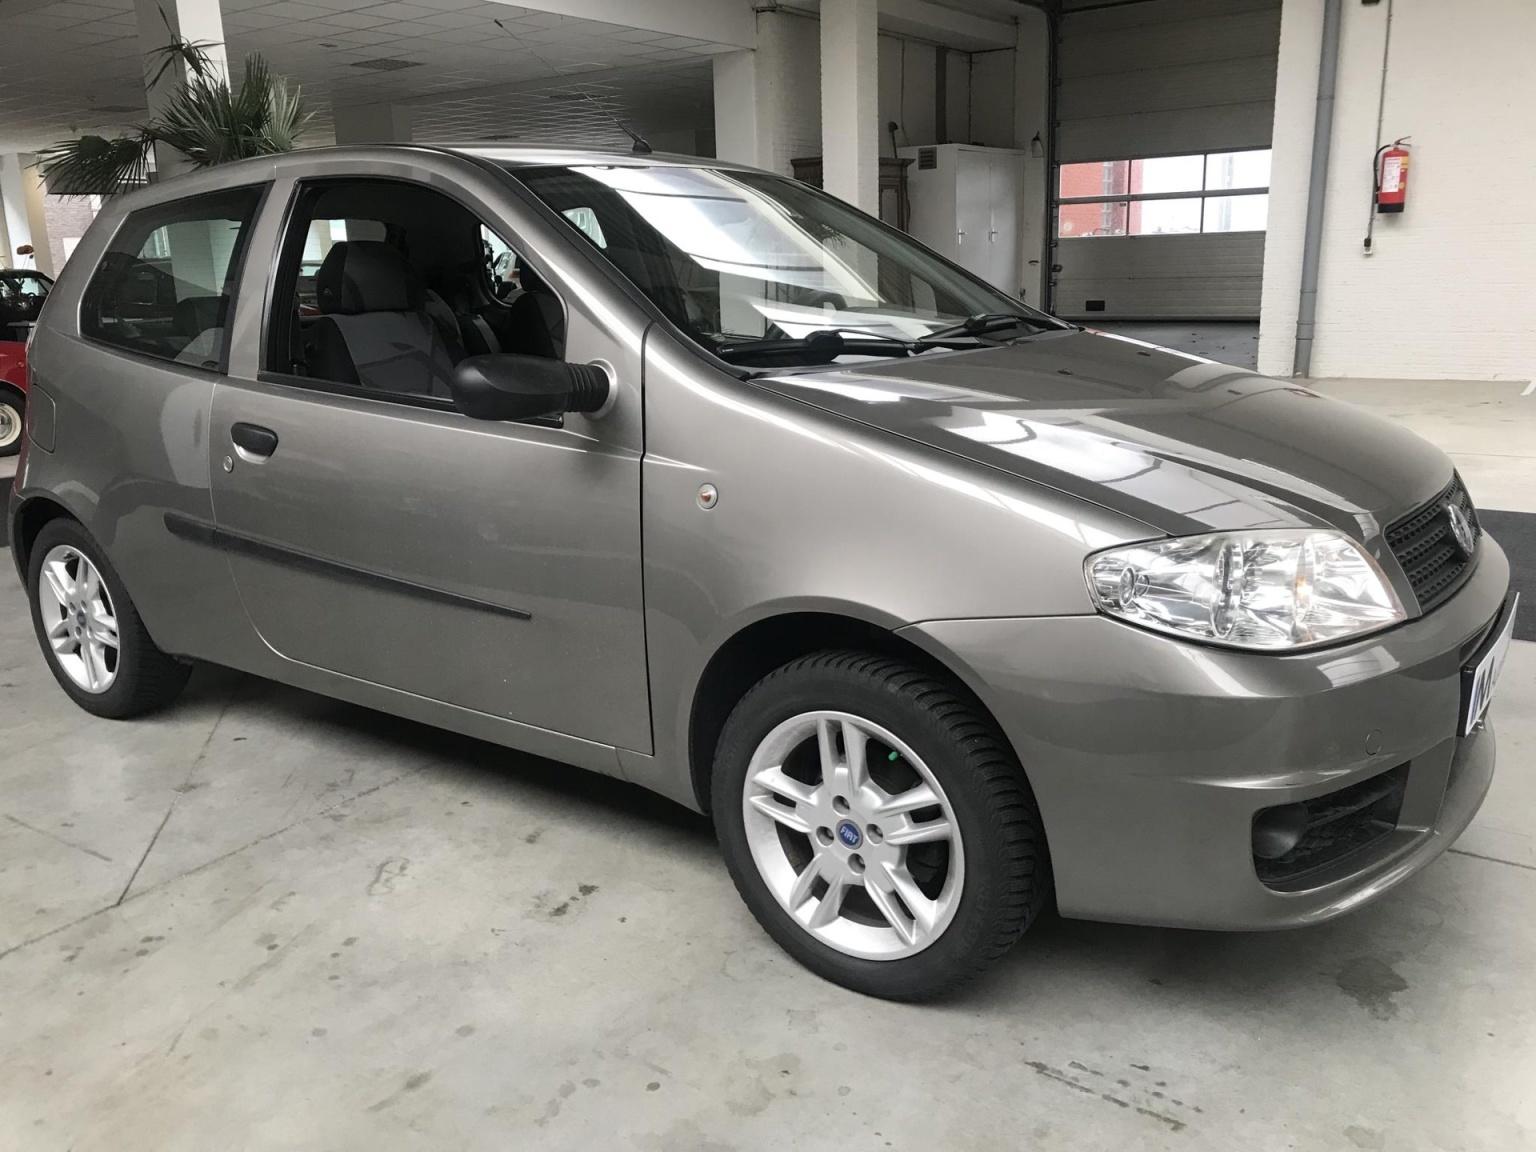 Fiat-Punto-8